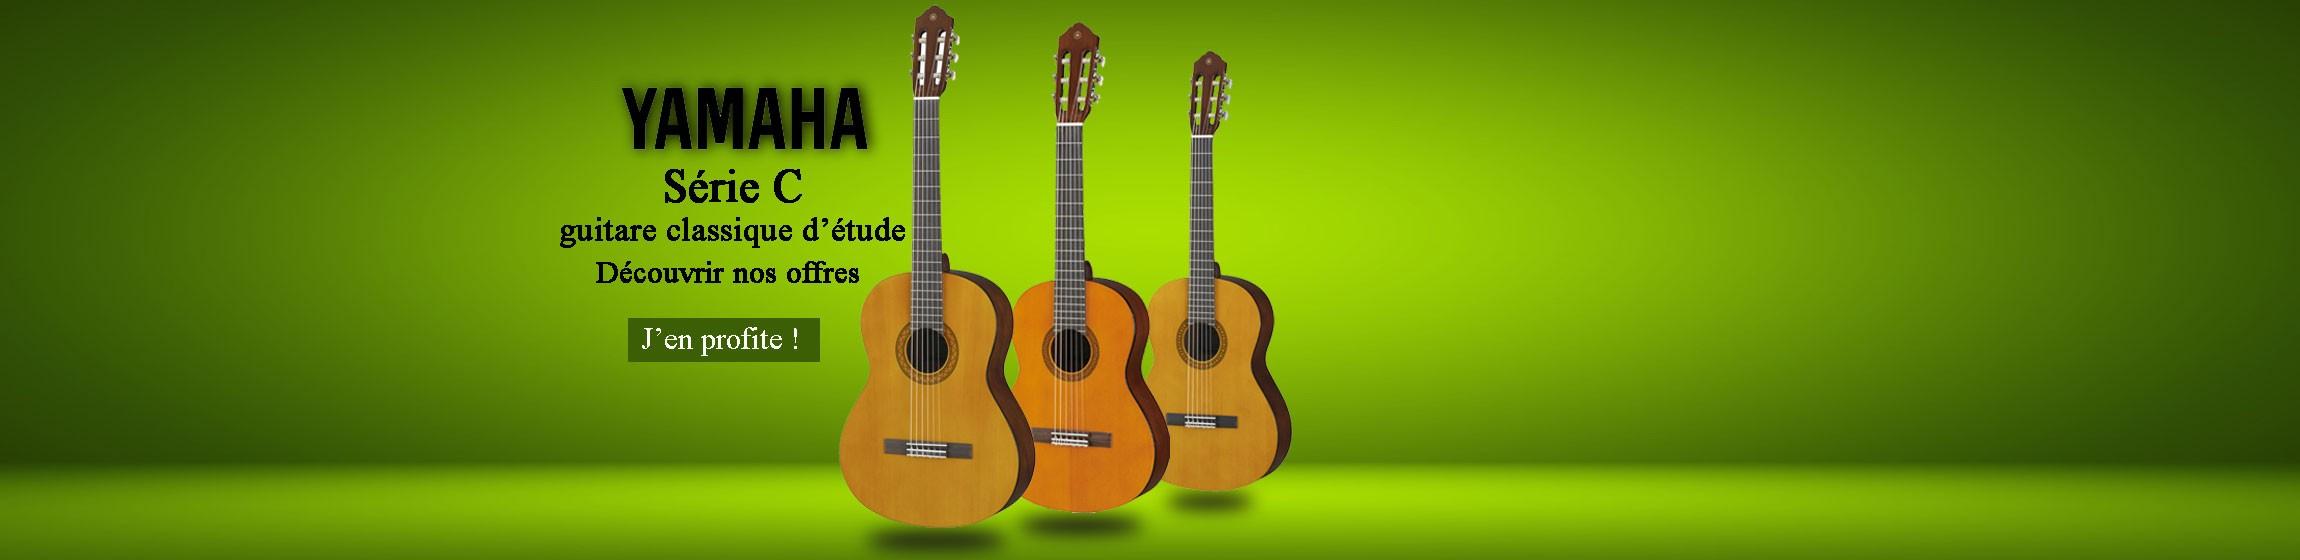 guitare classique yamaha série c